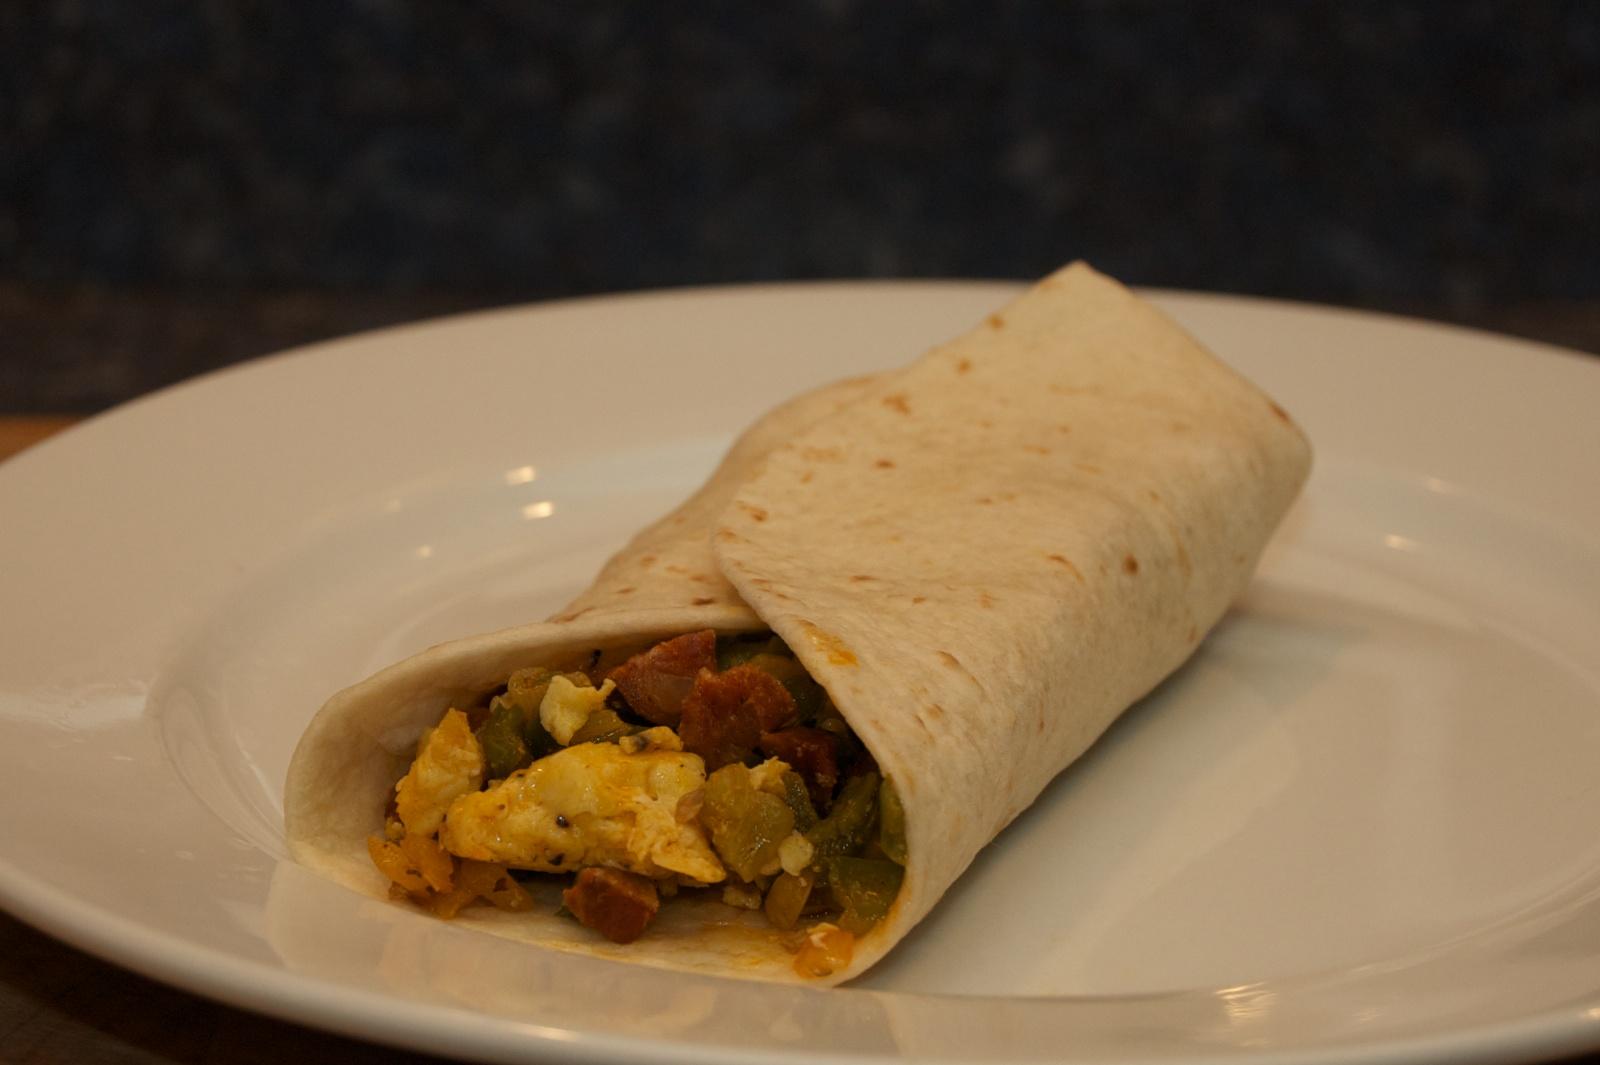 http://blog.rickk.com/food/2013/12/20/ate.2013.12.20.b.jpg